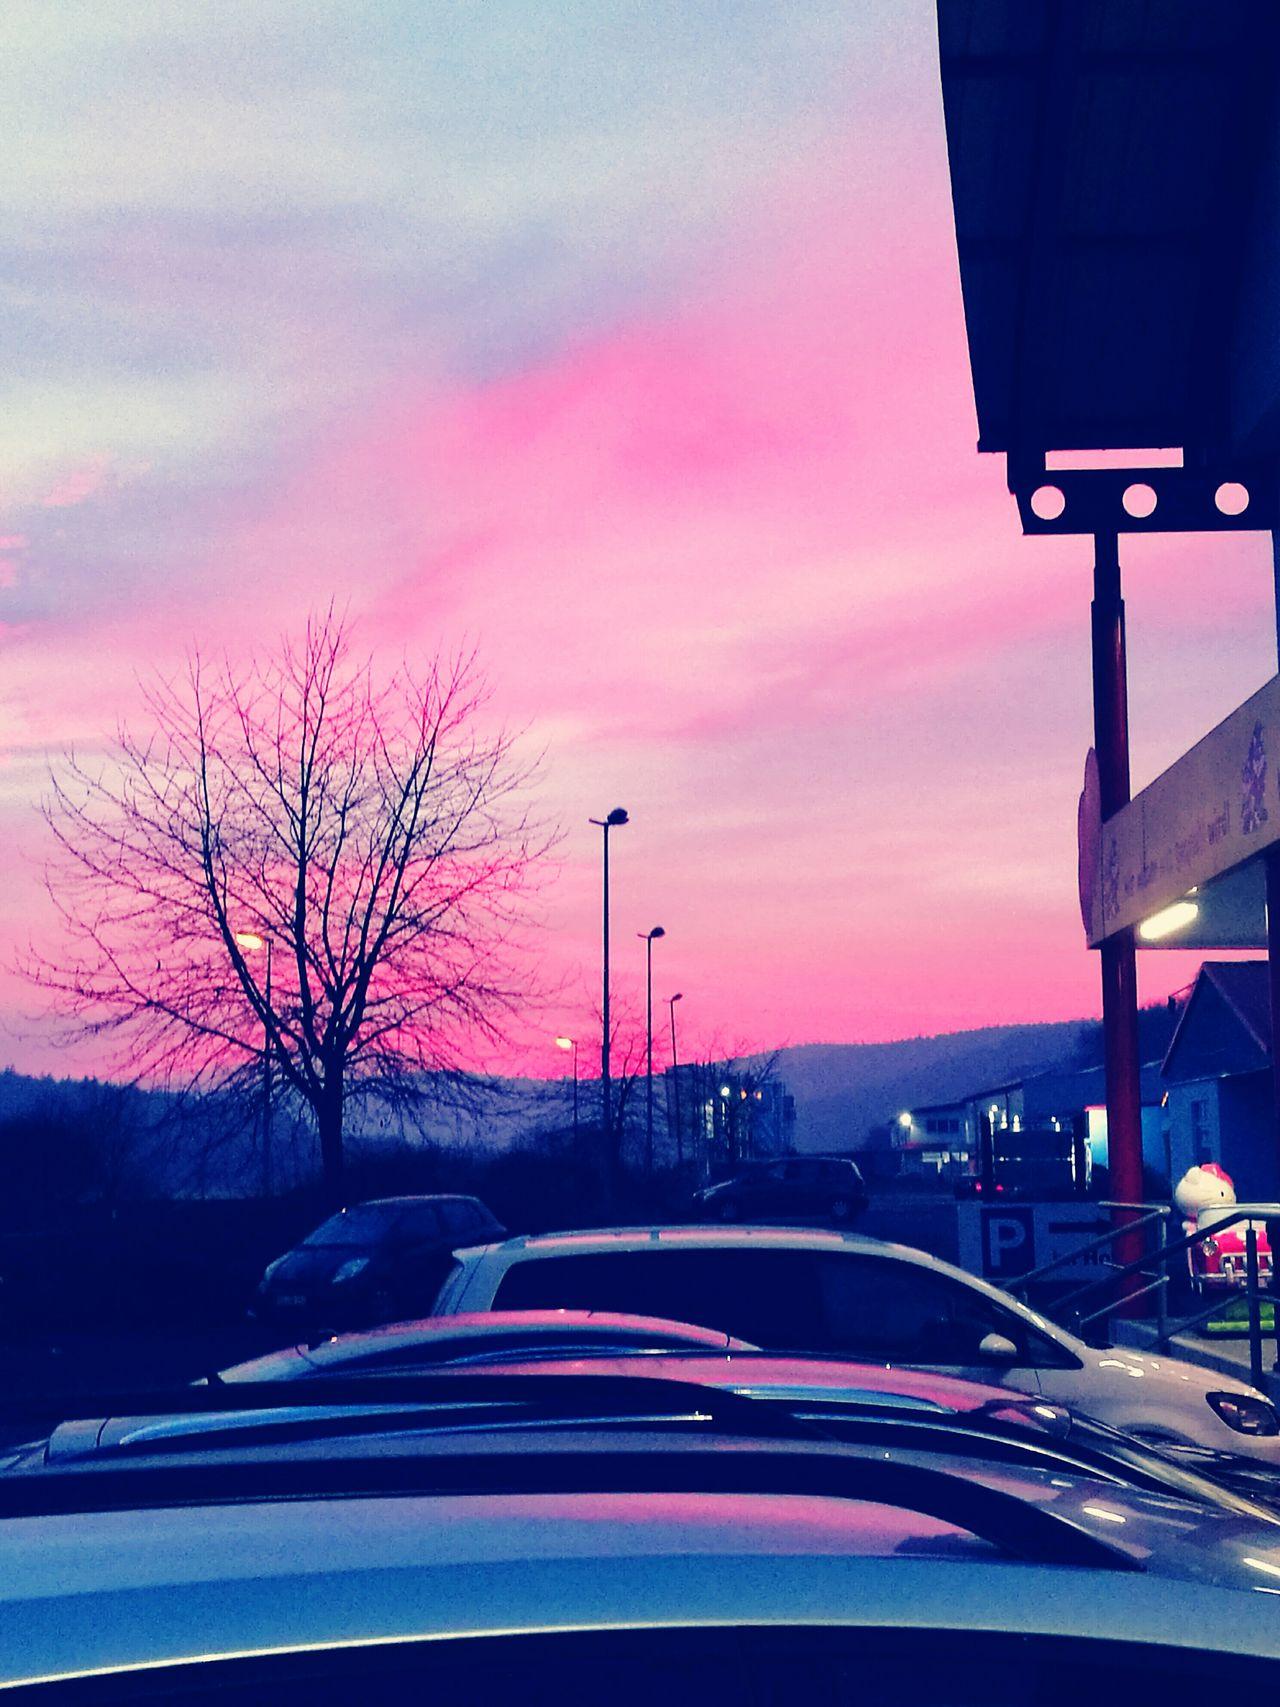 Sonnenuntergang Himmel Dreaming My Life Away ♥